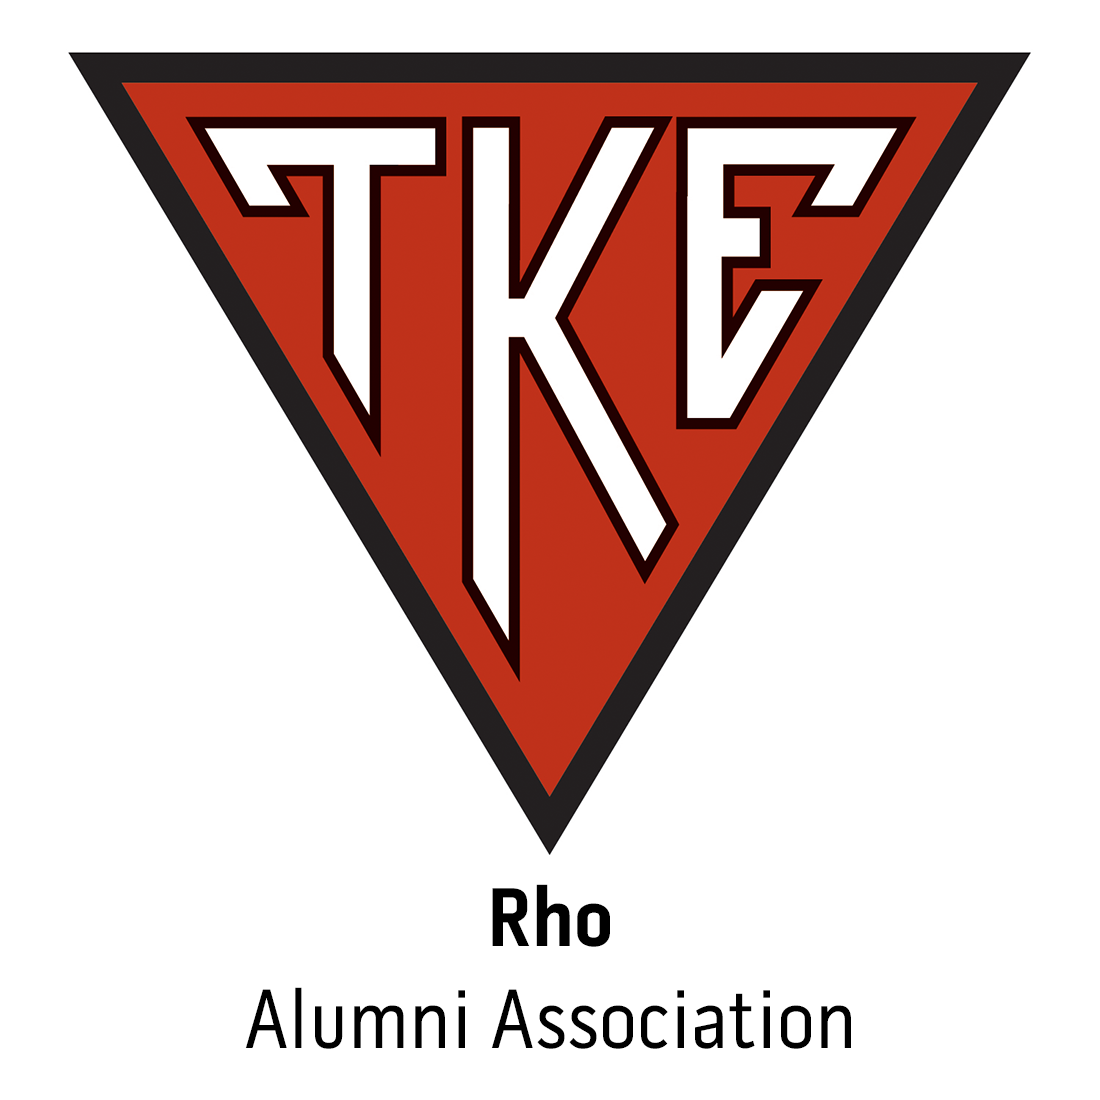 Rho Alumni Association for West Virginia University